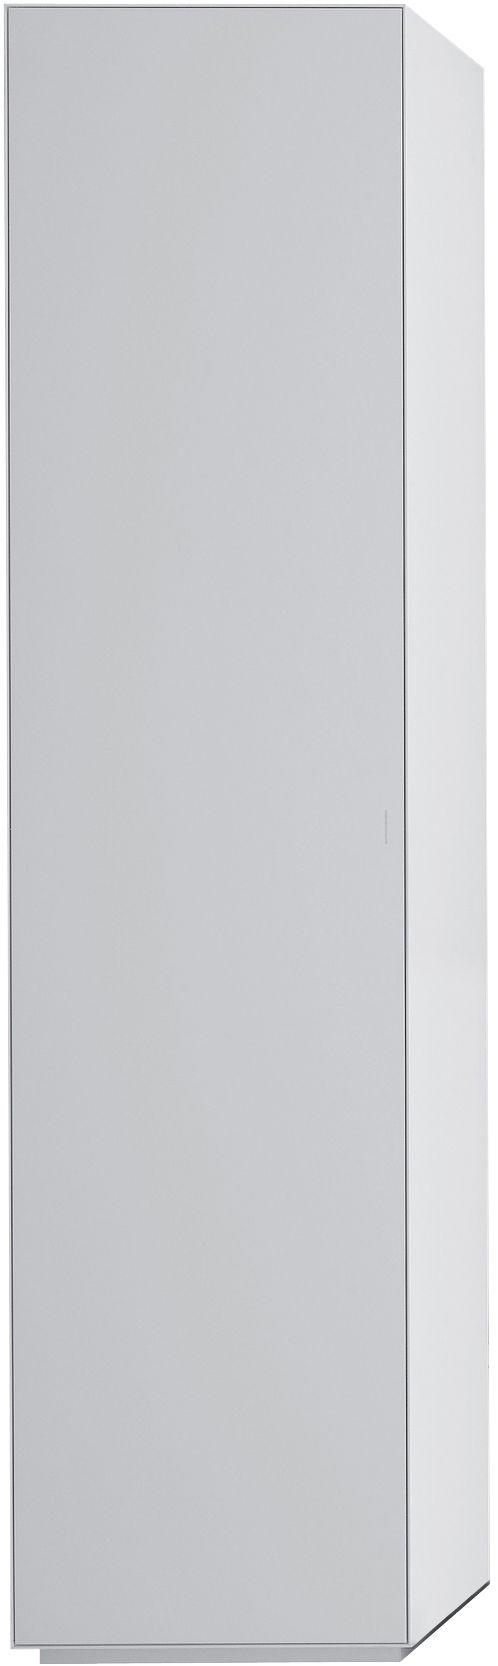 Furniture - Bookcases & Bookshelves - Inmotion Storage - Column 3 shelves - H 188 x W 45 cm by MDF Italia - H 188 x W 45 cm / Matt White - MDF